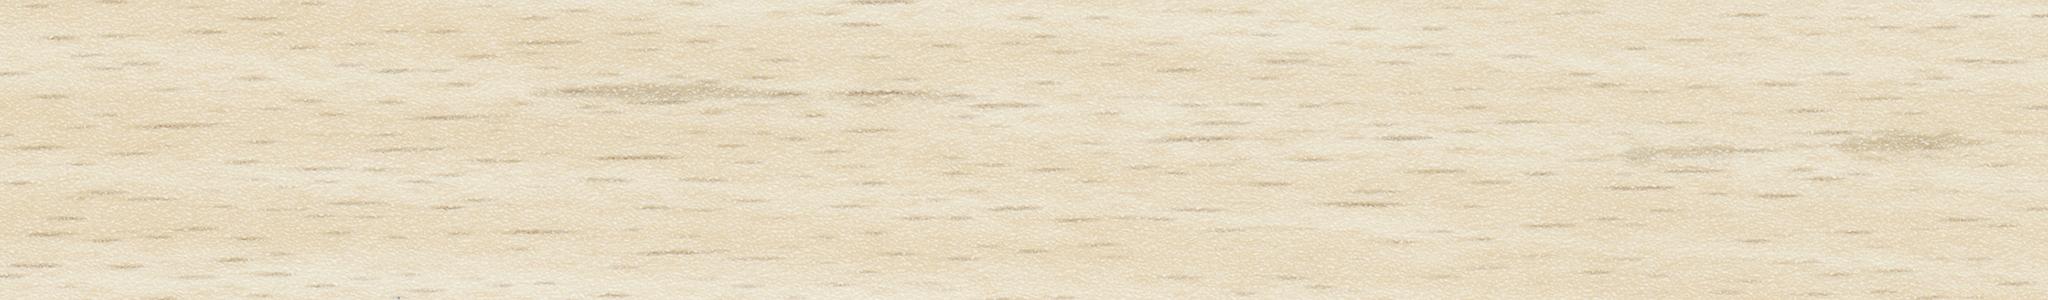 HD 21618 ABS hrana buk přírodní perla